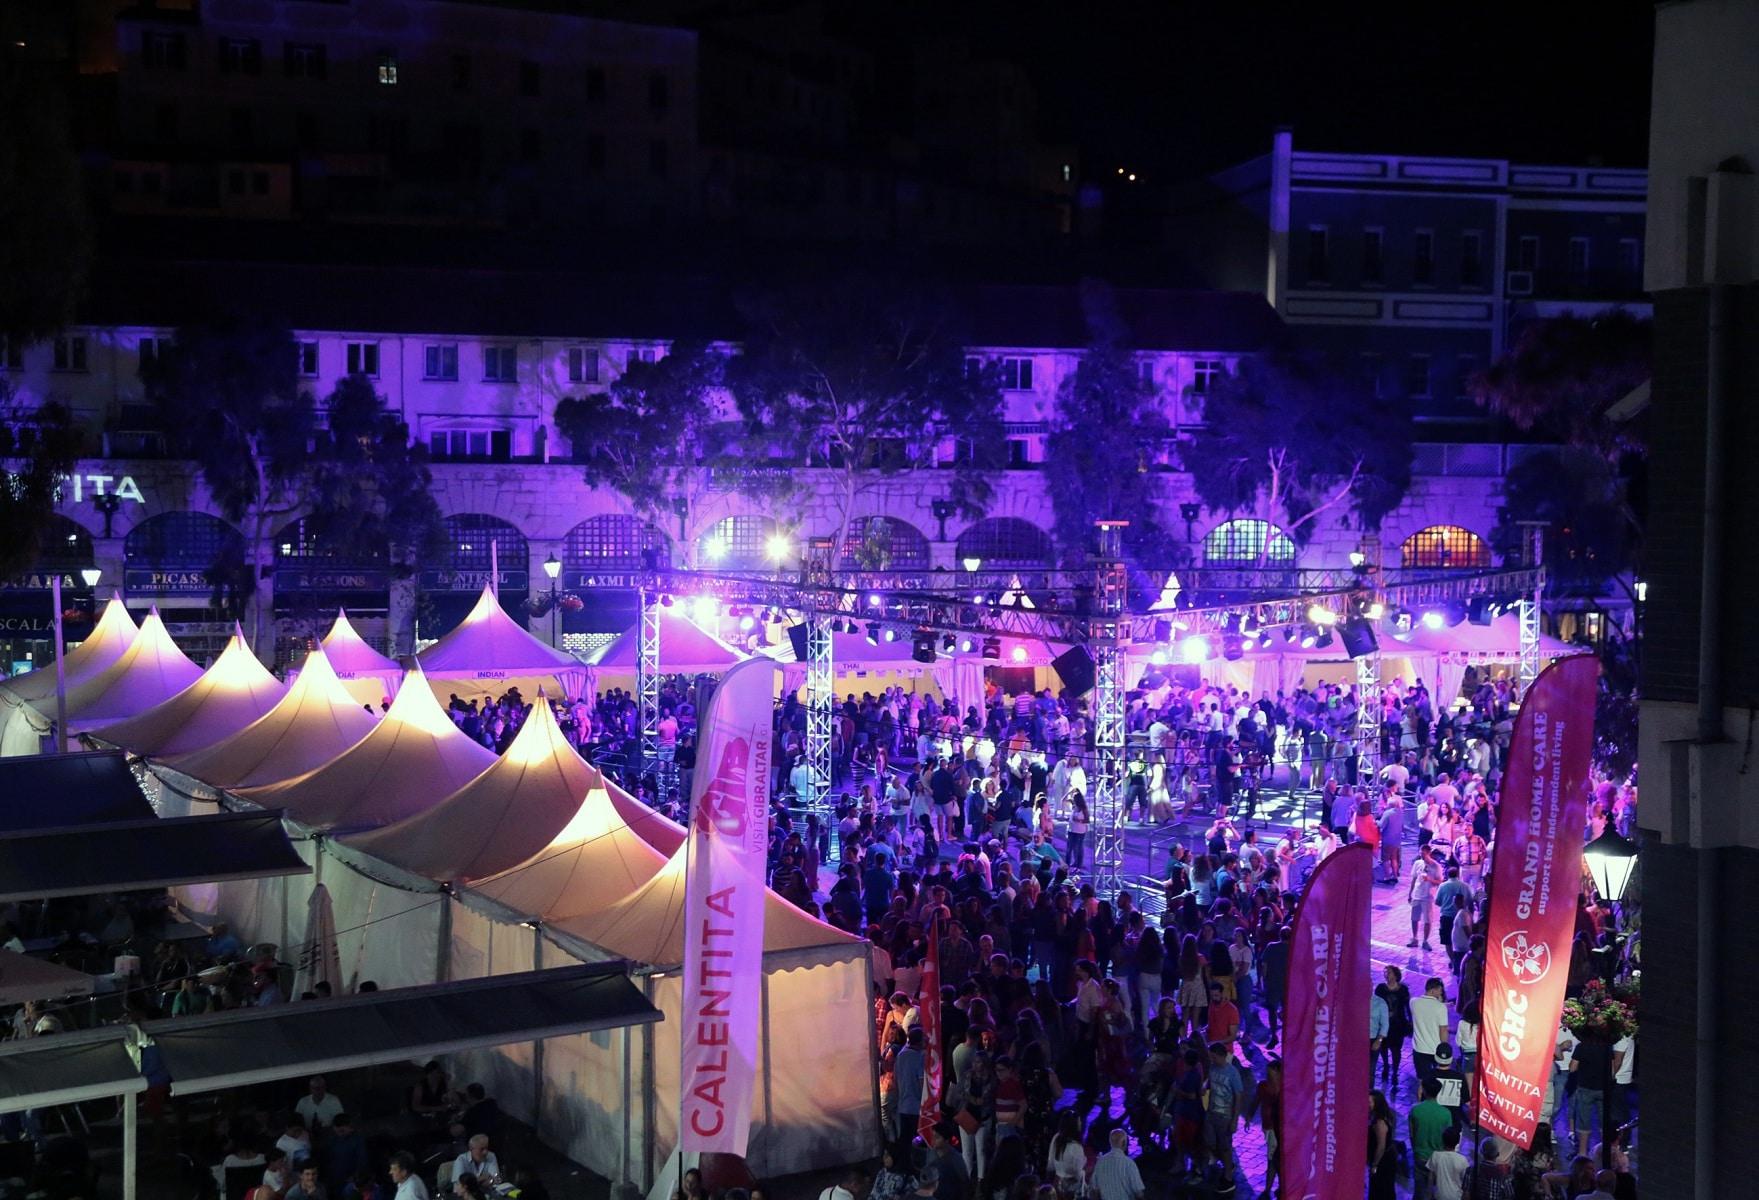 18-jun-2016-noche-de-la-calentita-en-gibraltar_27799754666_o